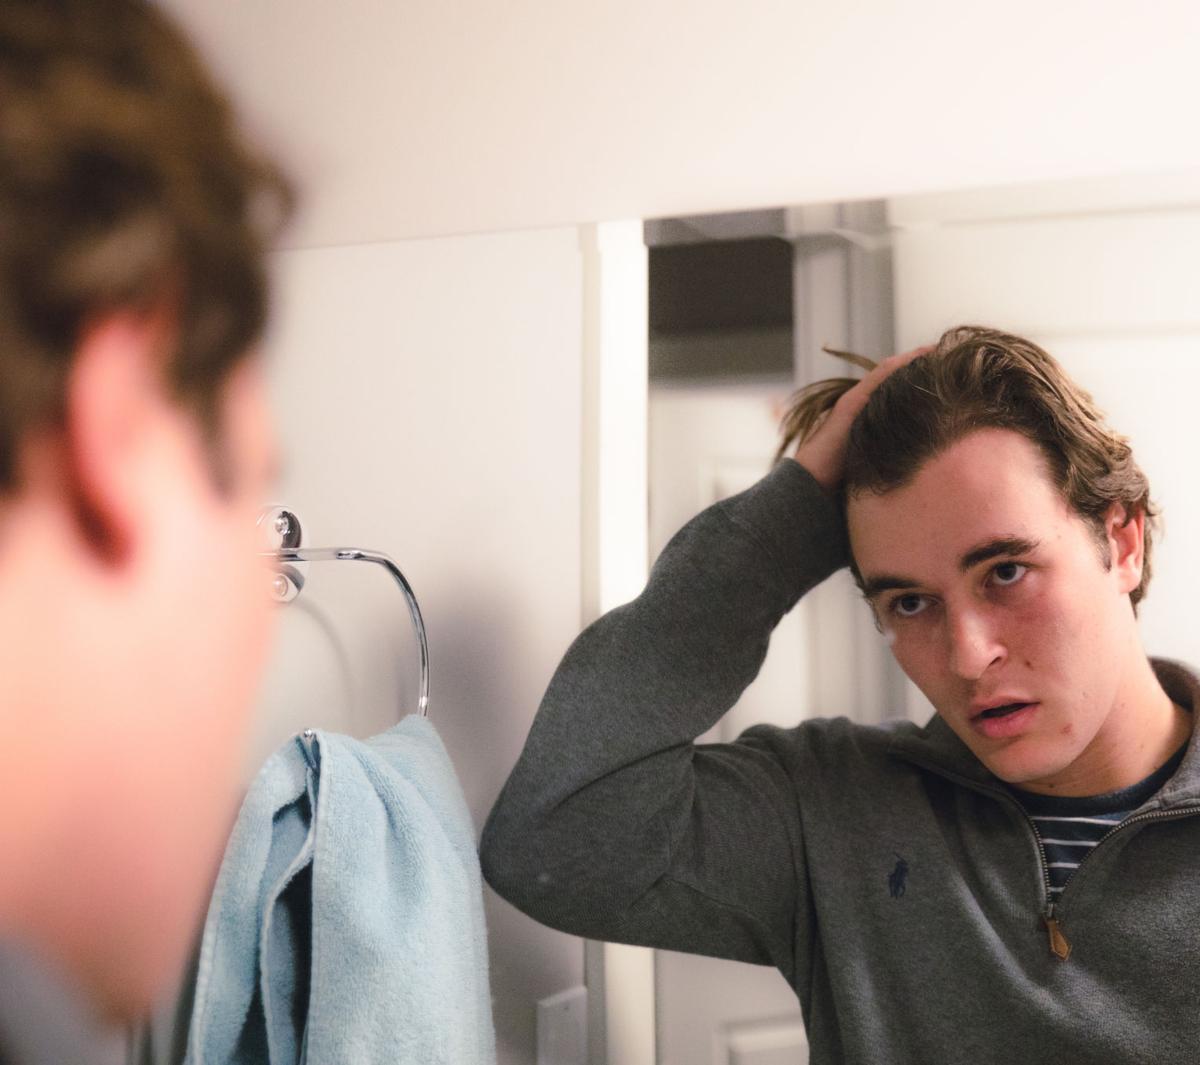 Perfectionism mirror